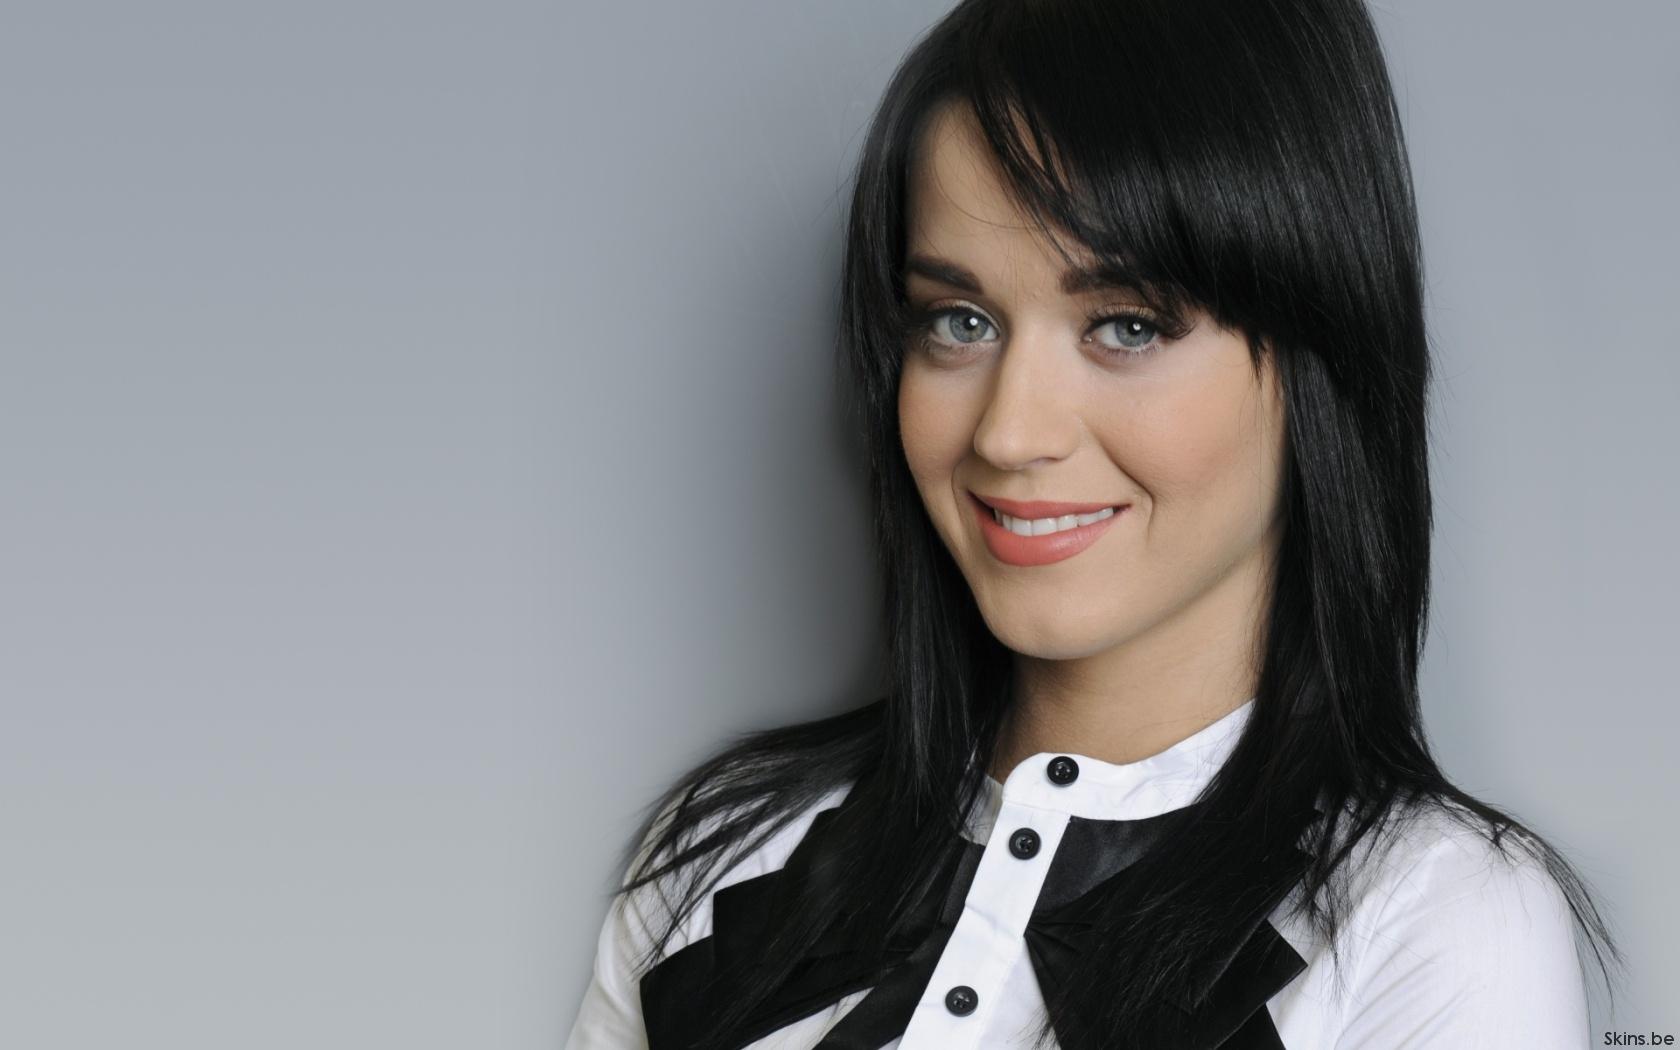 Katy Perry - 1680x1050